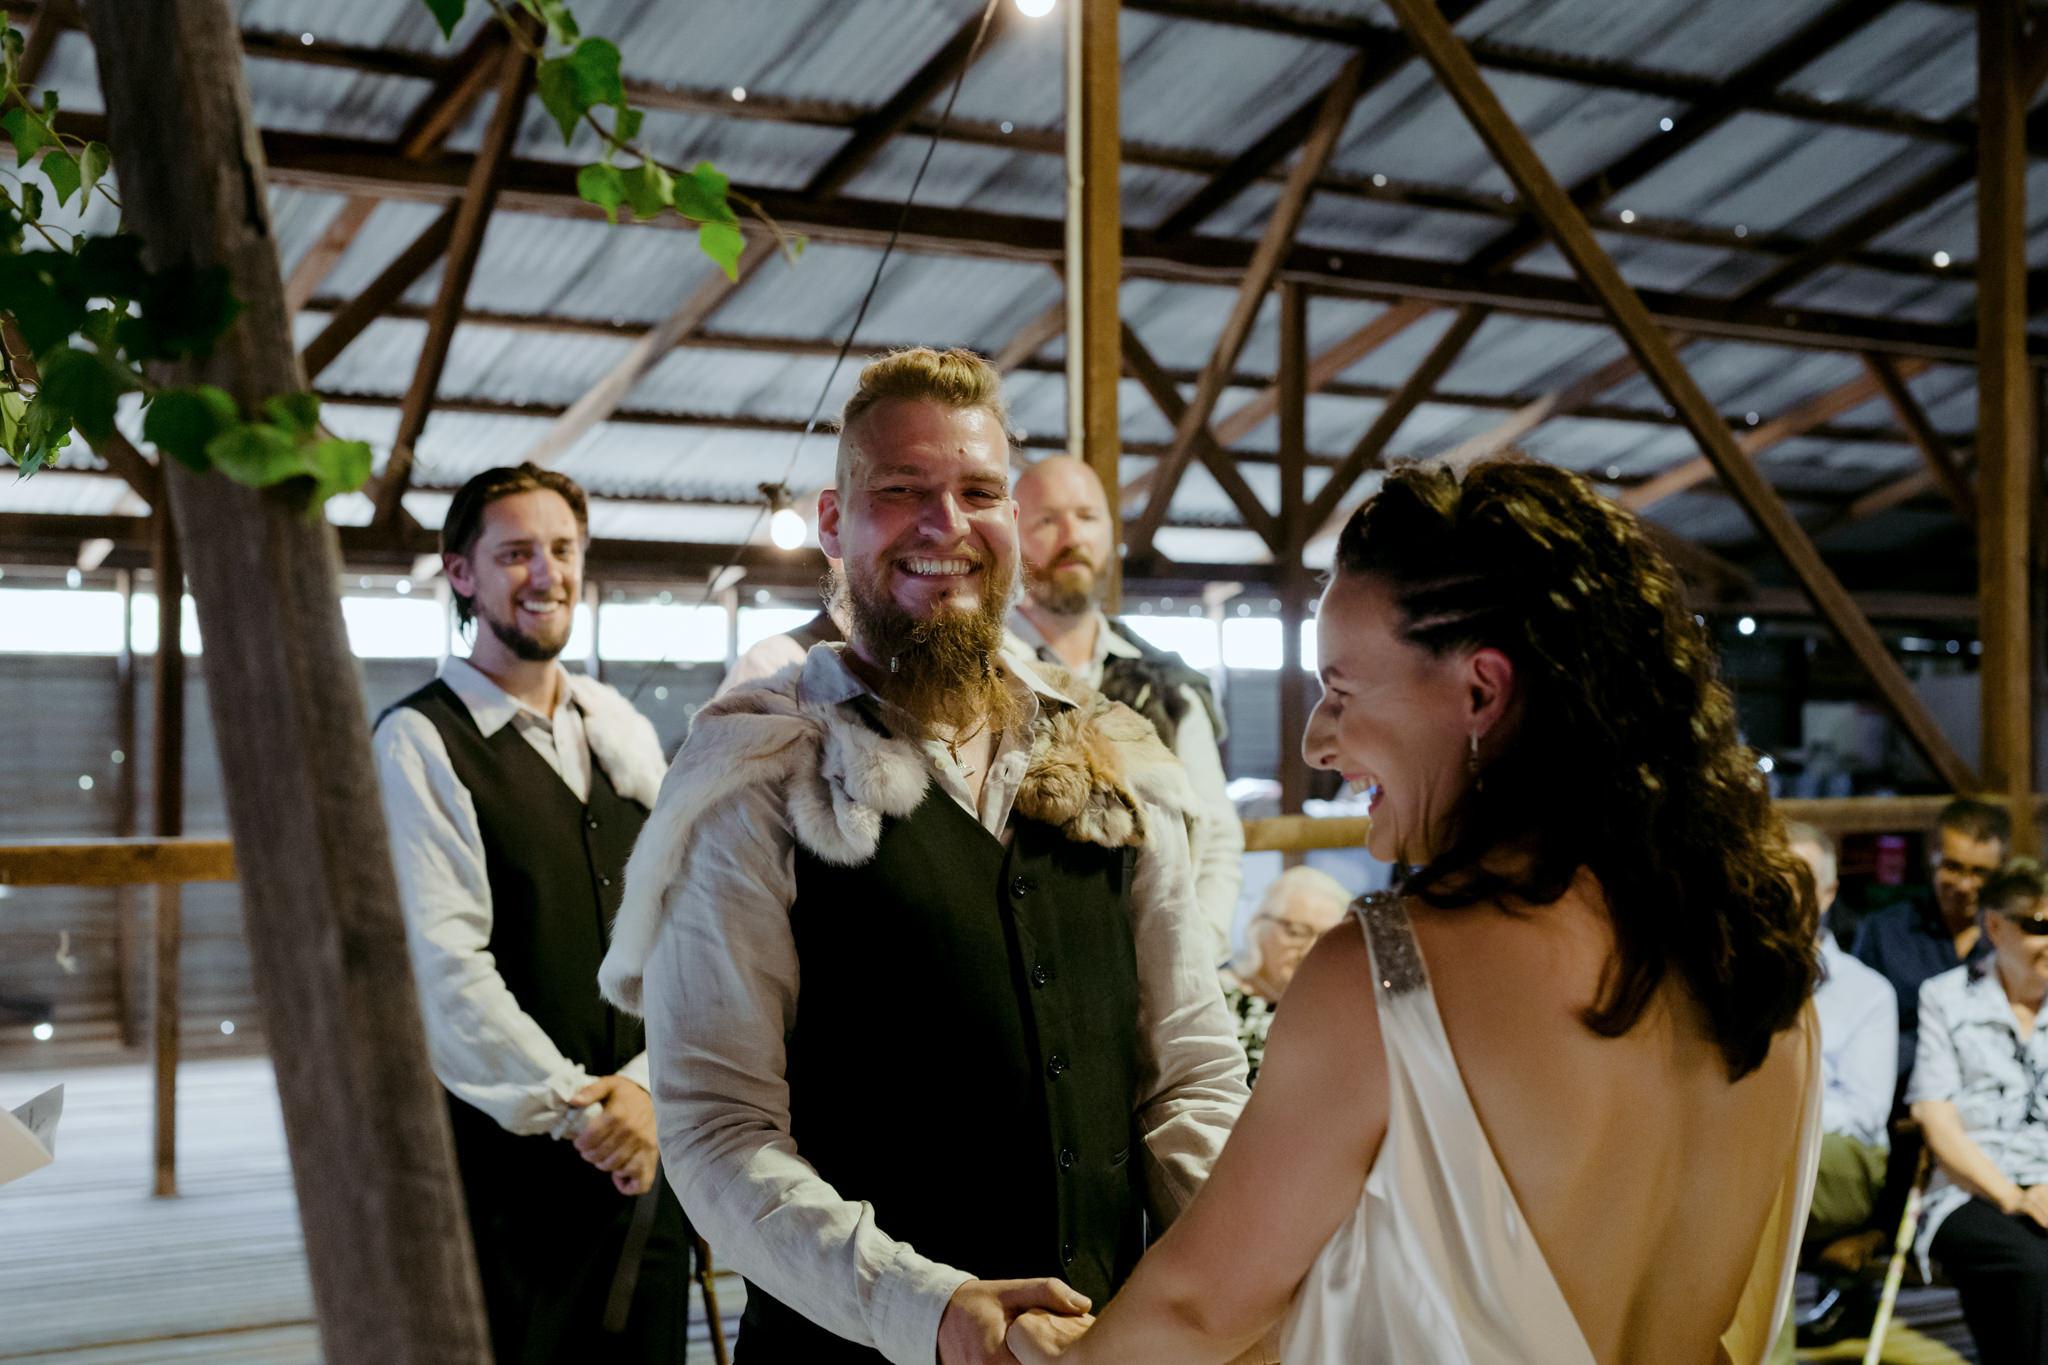 Yarralumla Woolshed Canberra Wedding Photographer Erin Latimore_096.JPG